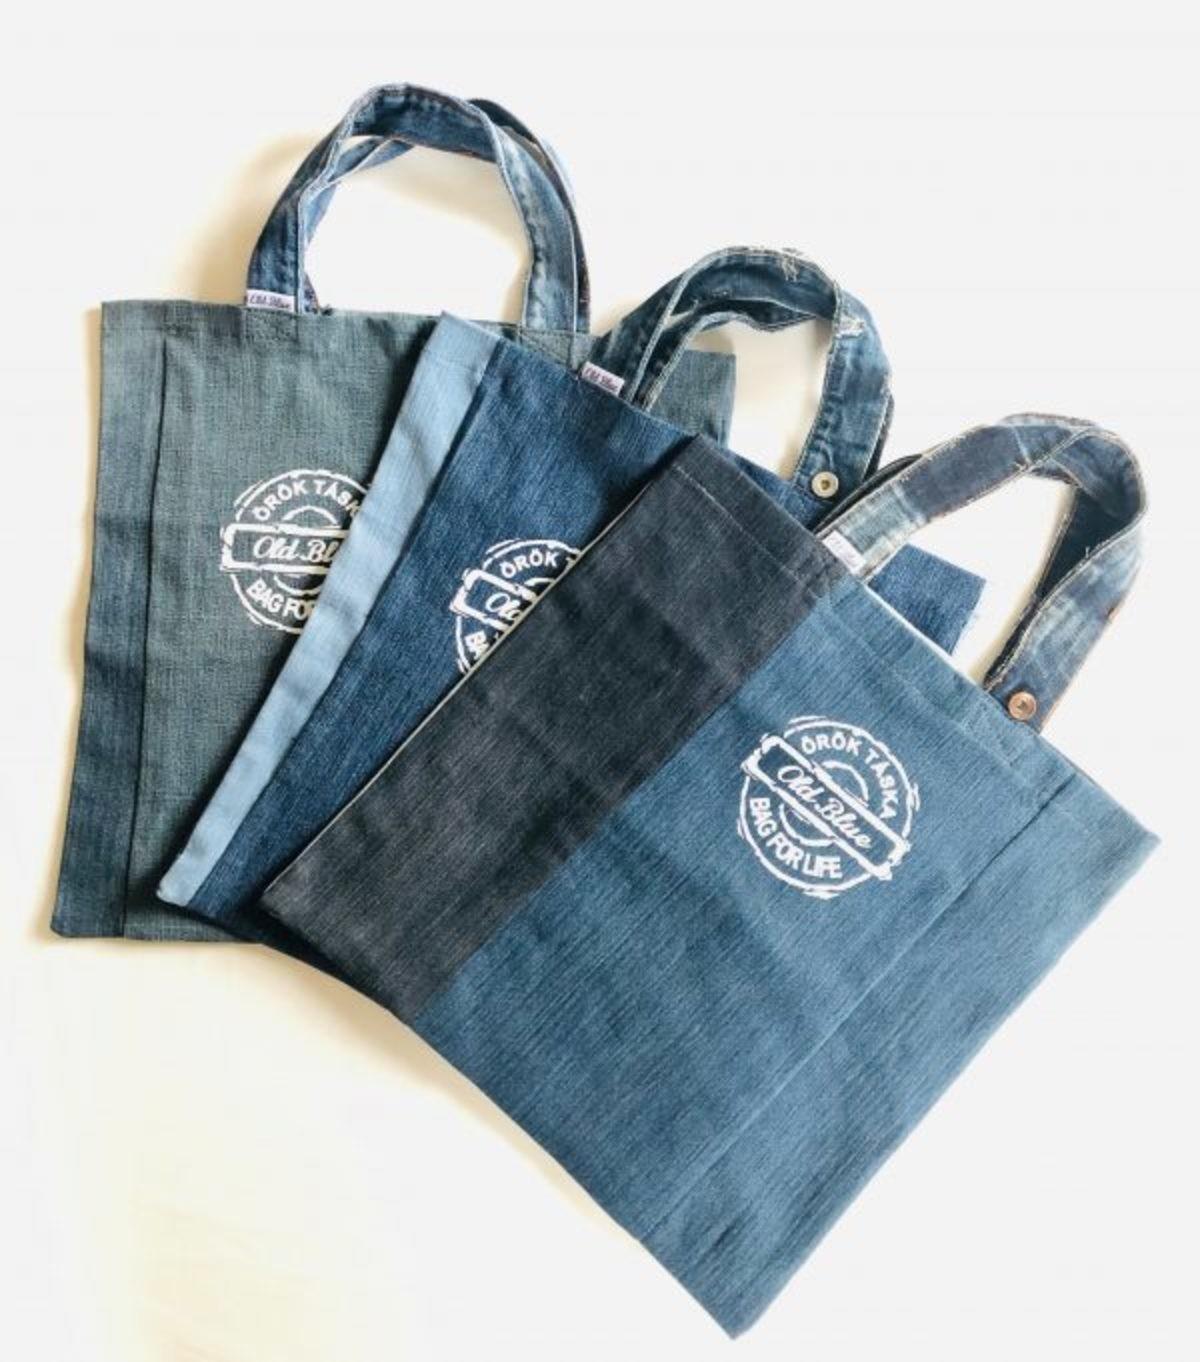 OldBlue bag for life